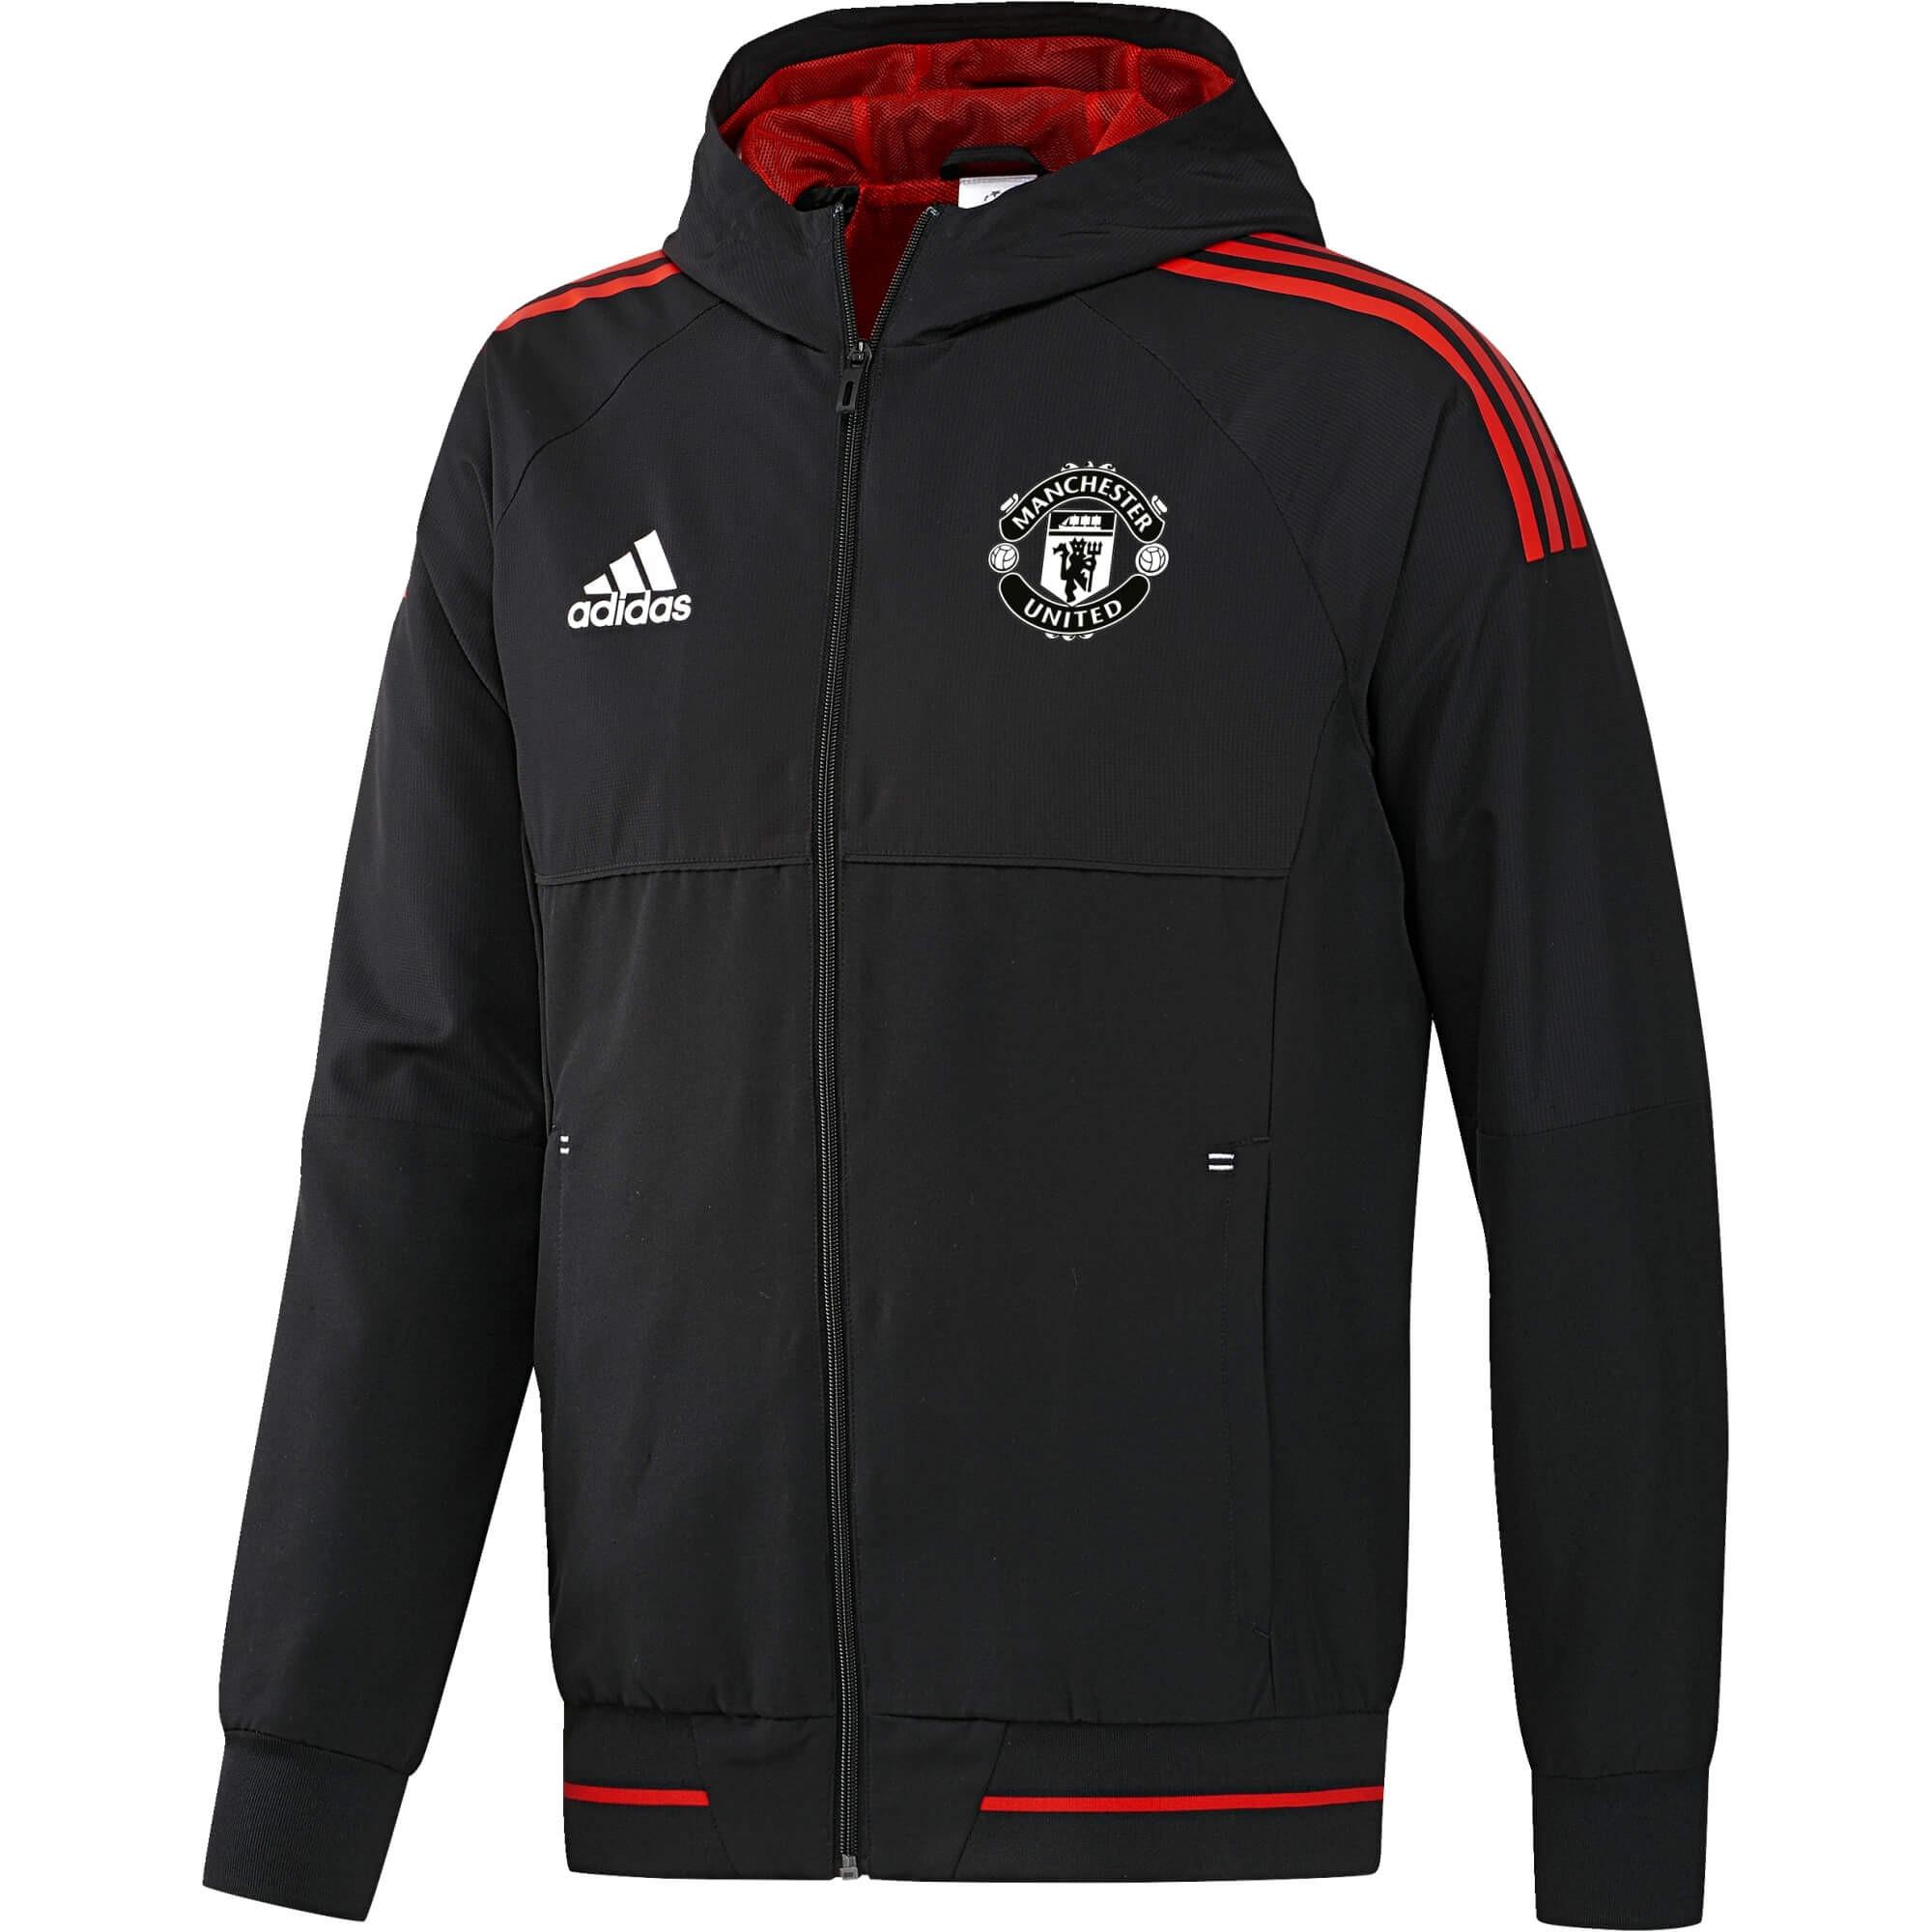 20172018 Jkt Adidas Manchester Eu Pre United Noir qYfIYw4